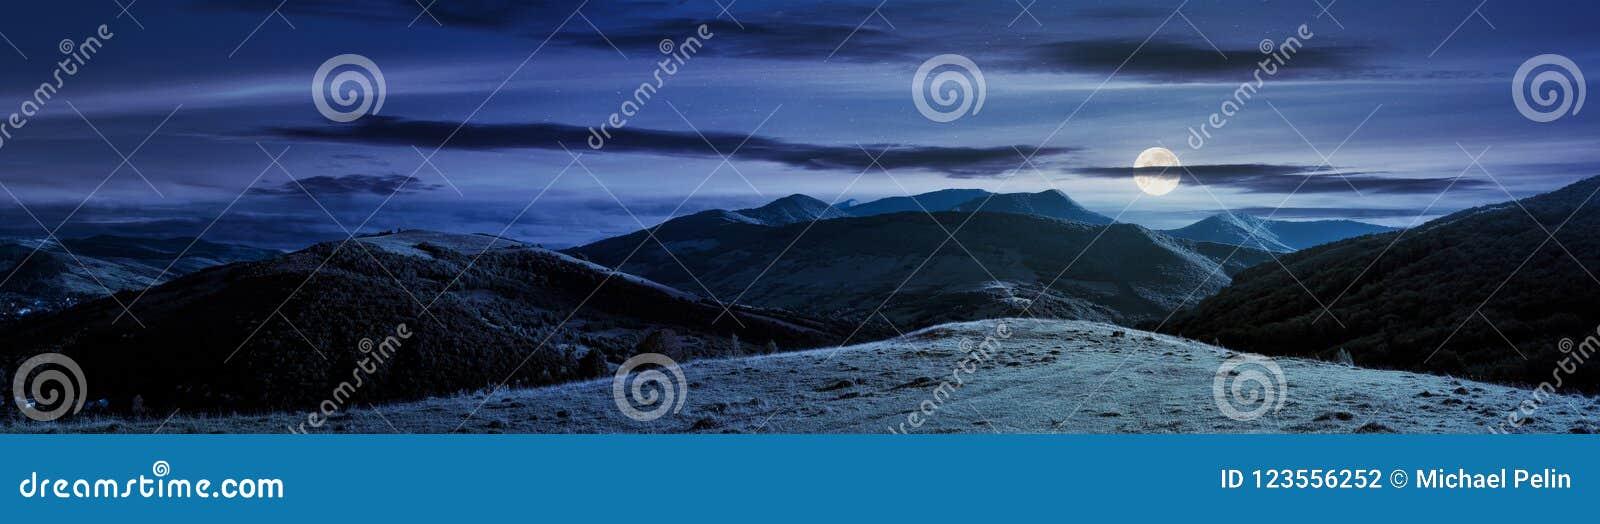 Panorama der Gebirgslandschaft nachts